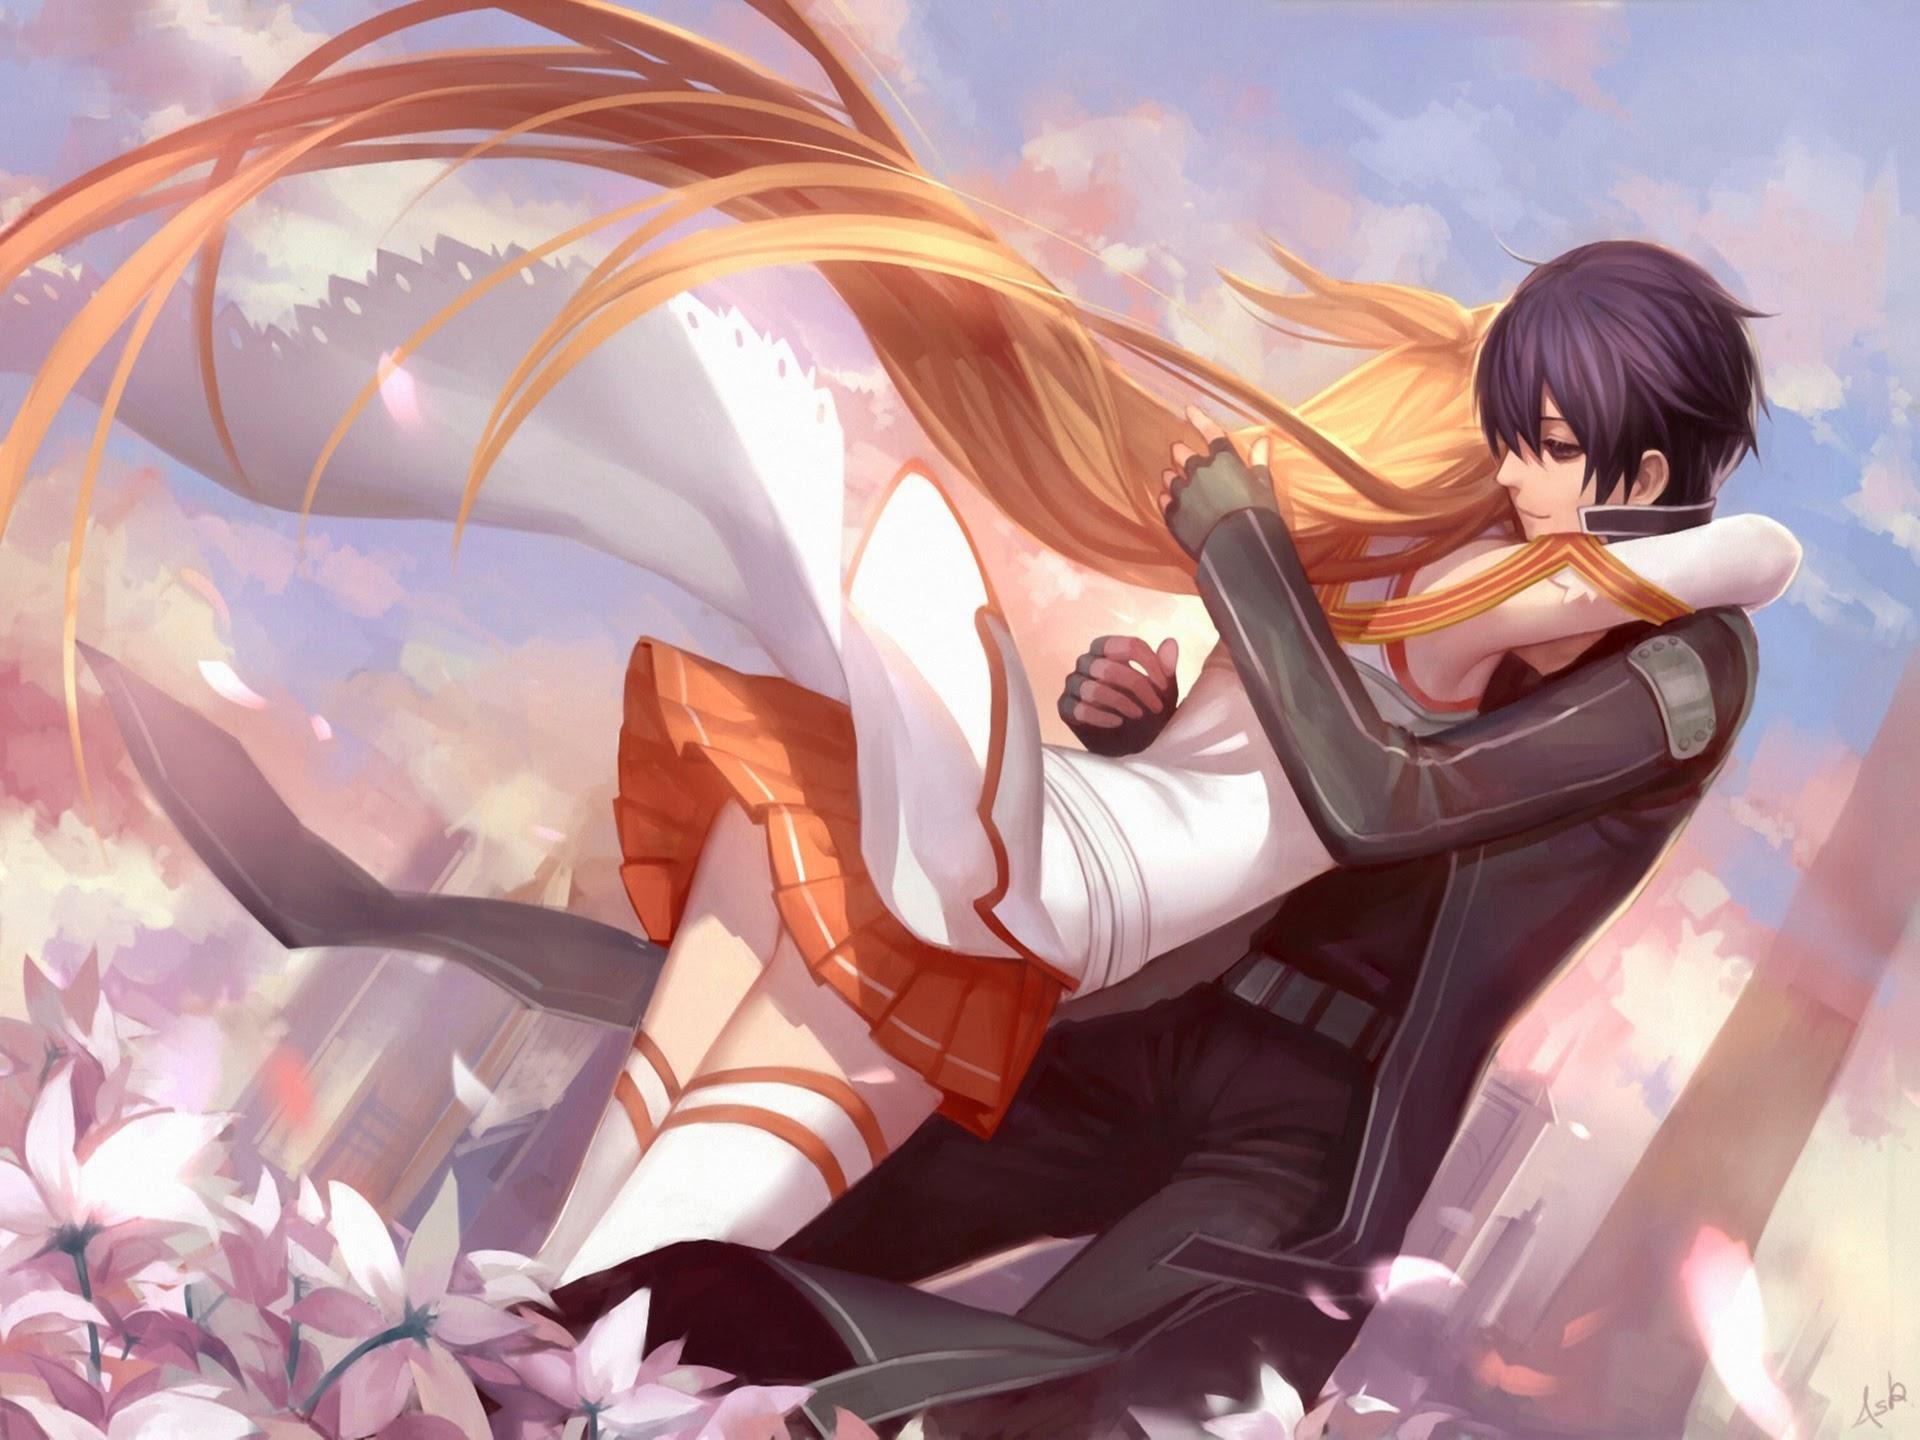 Anime sword art online kirito and asuna photo